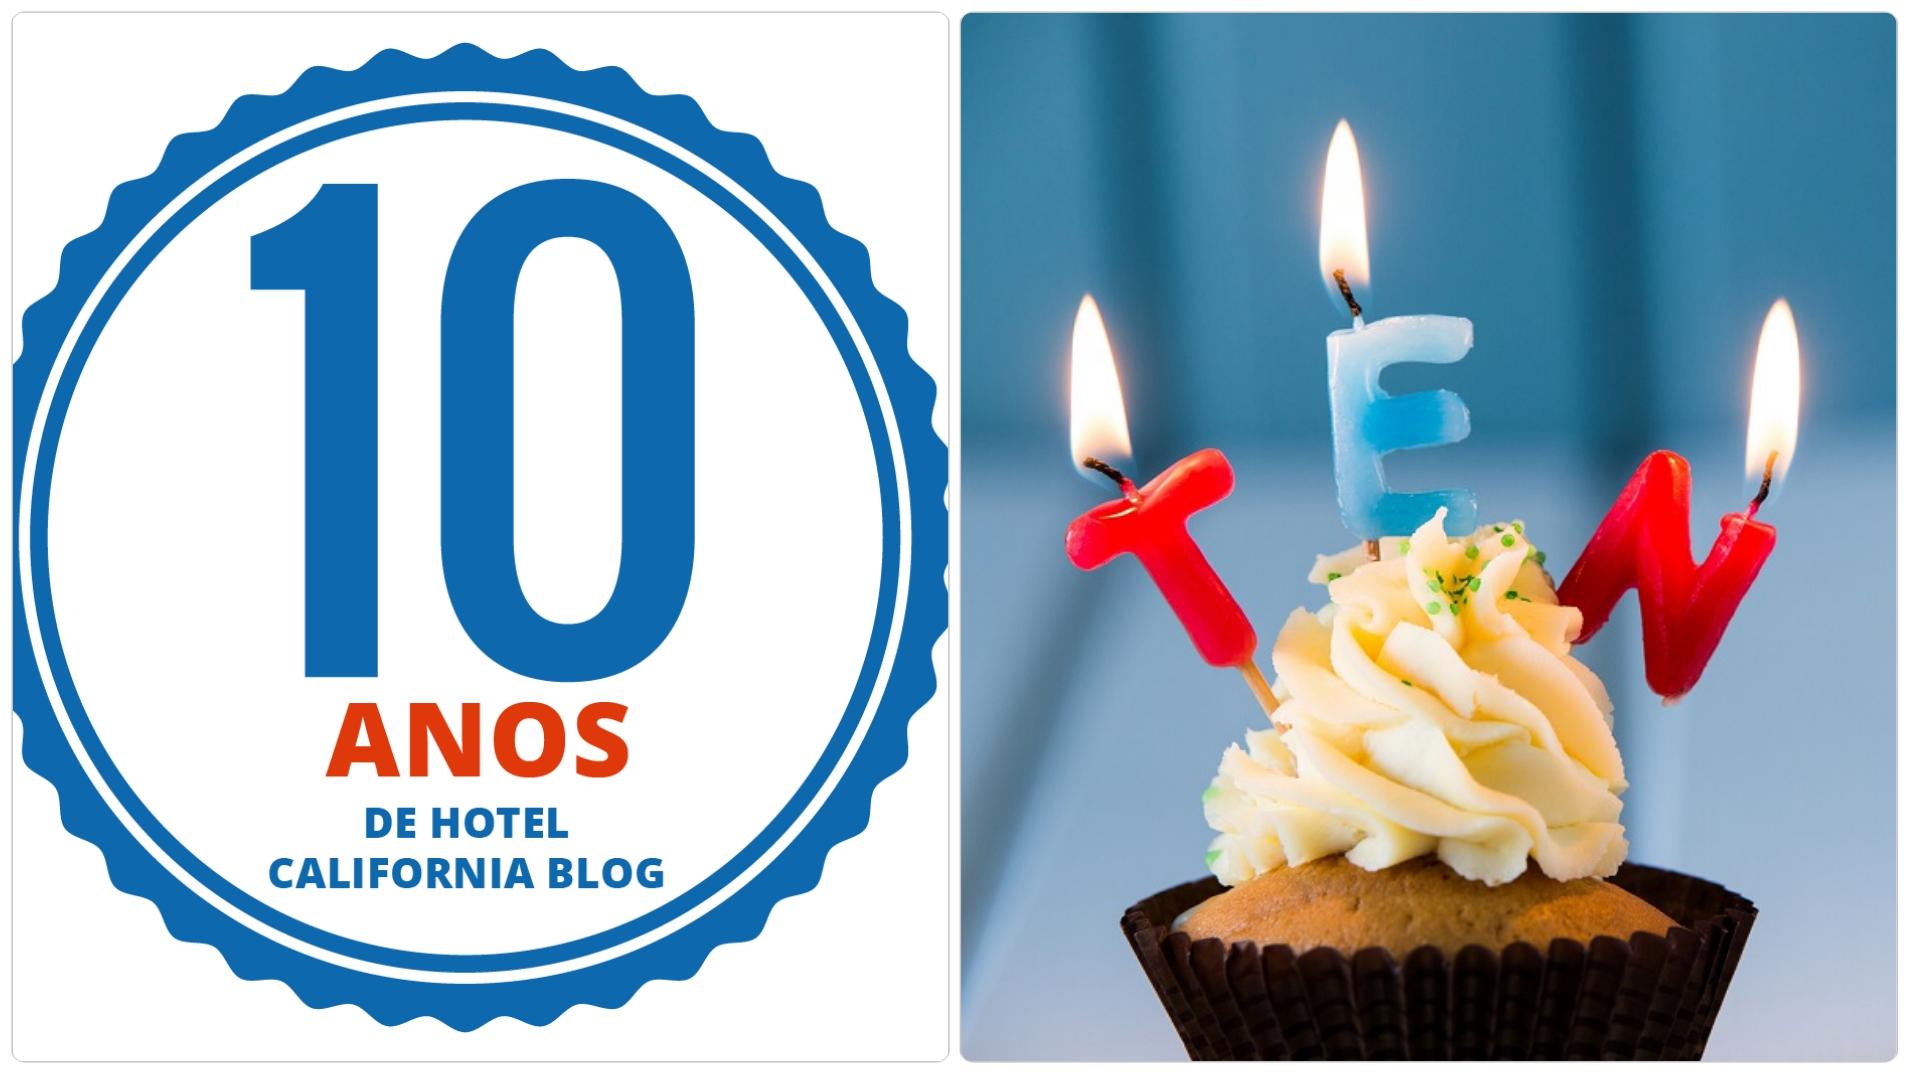 #10anoshotelcaliforniablog